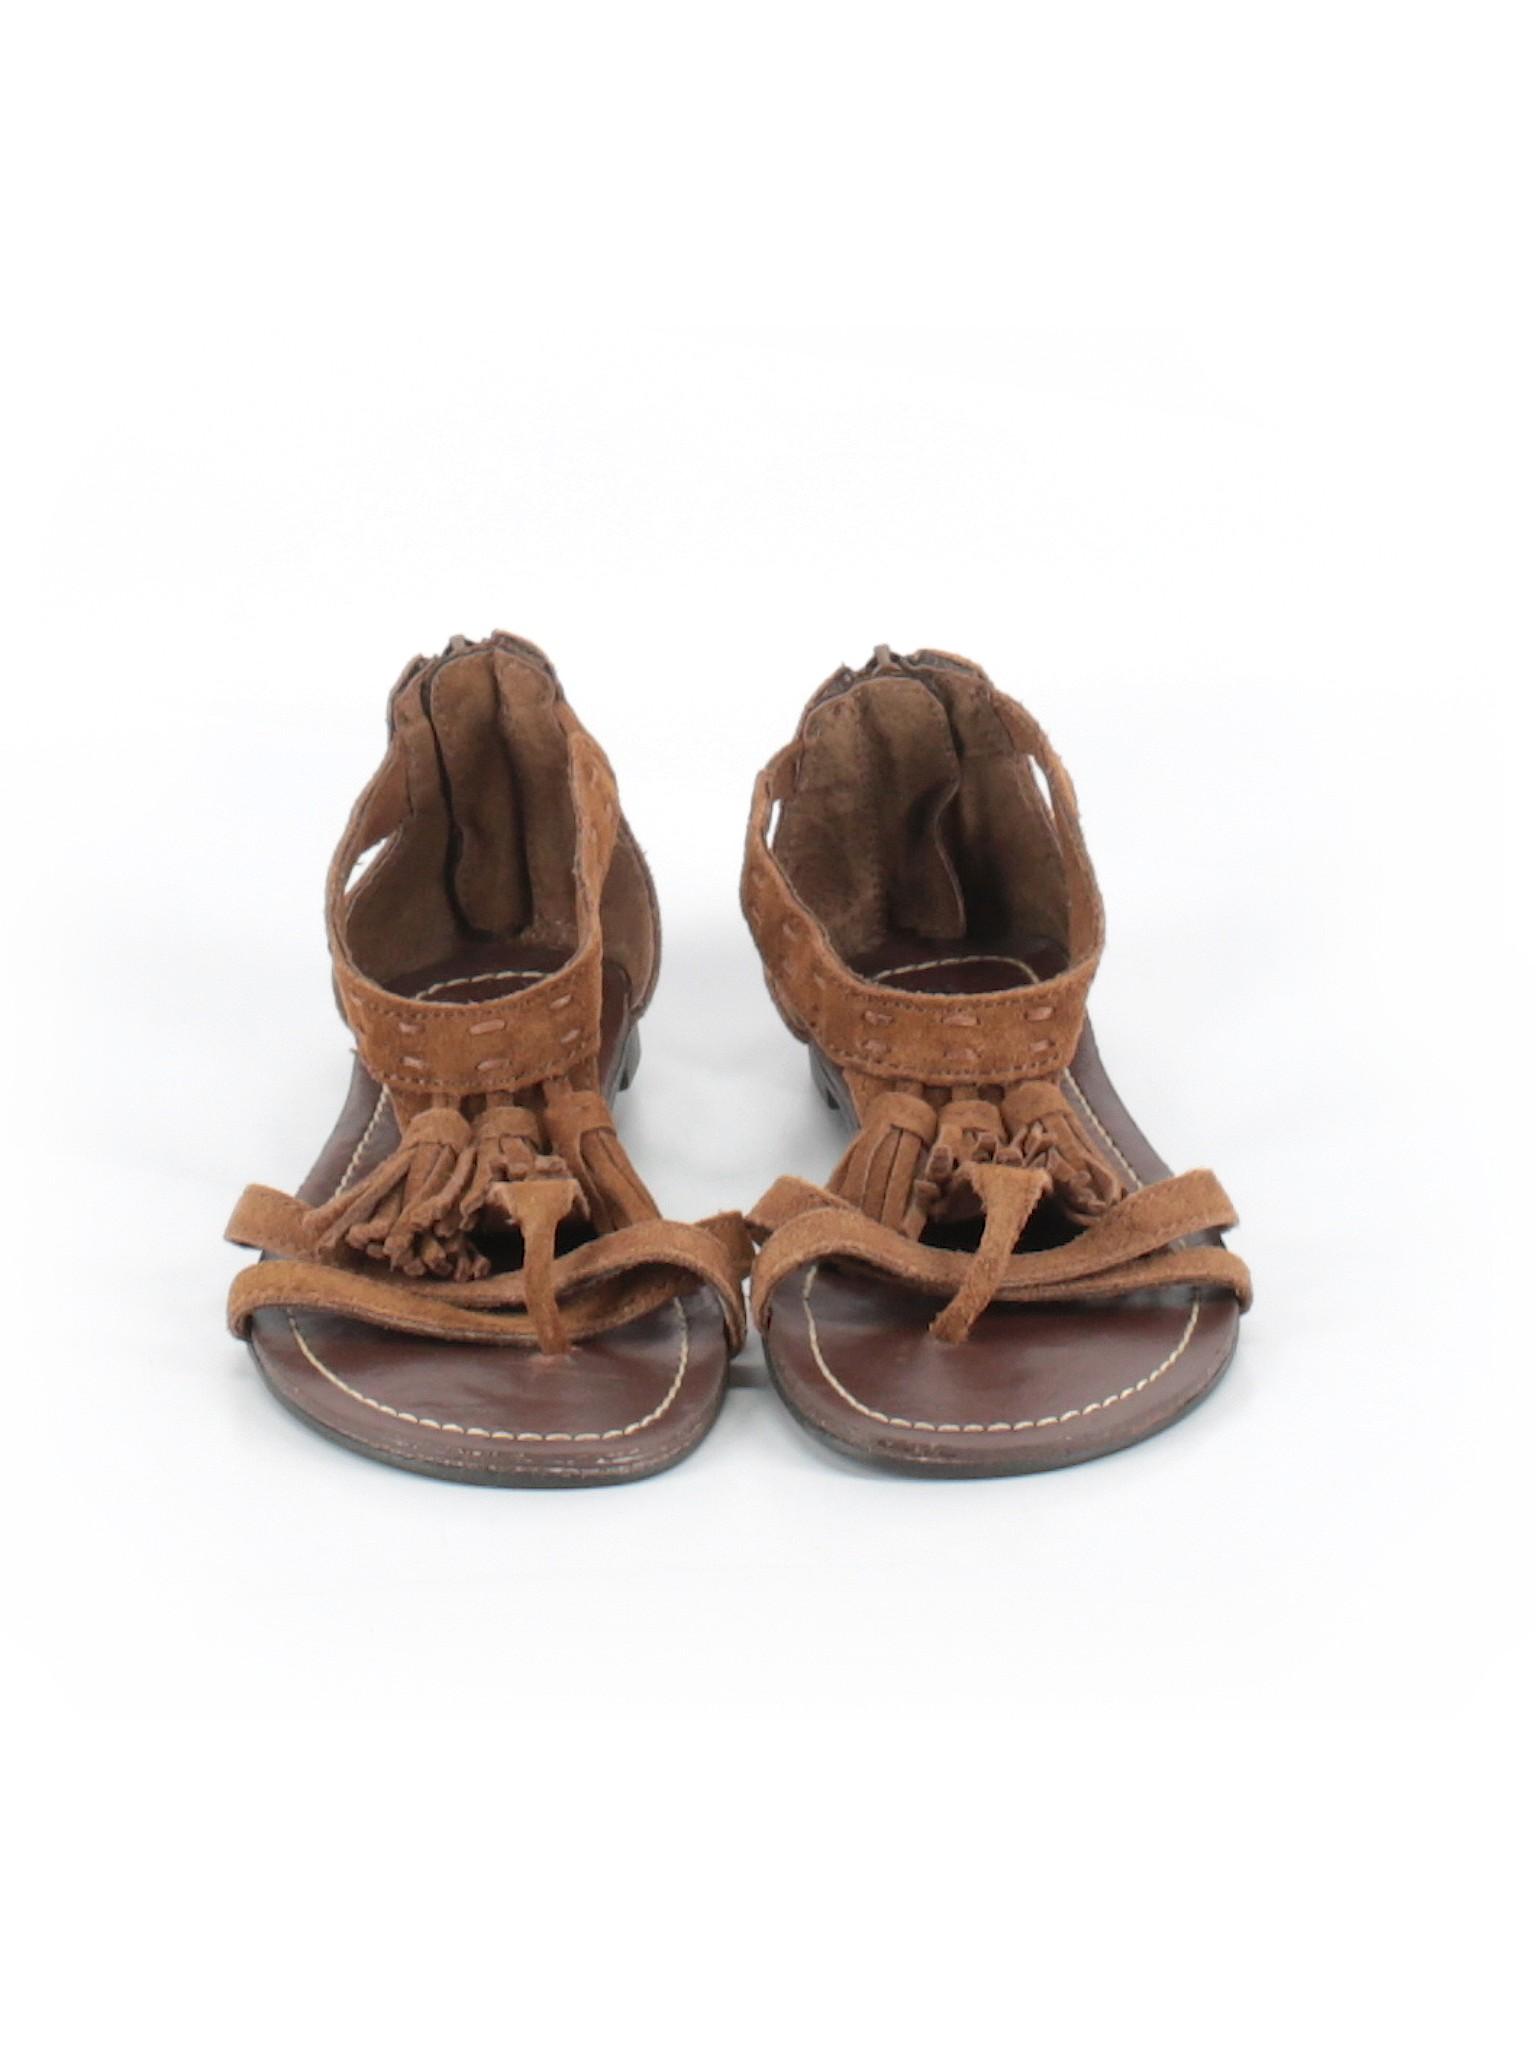 Boutique Minnetonka promotion promotion Sandals Boutique Oxd6wgg4